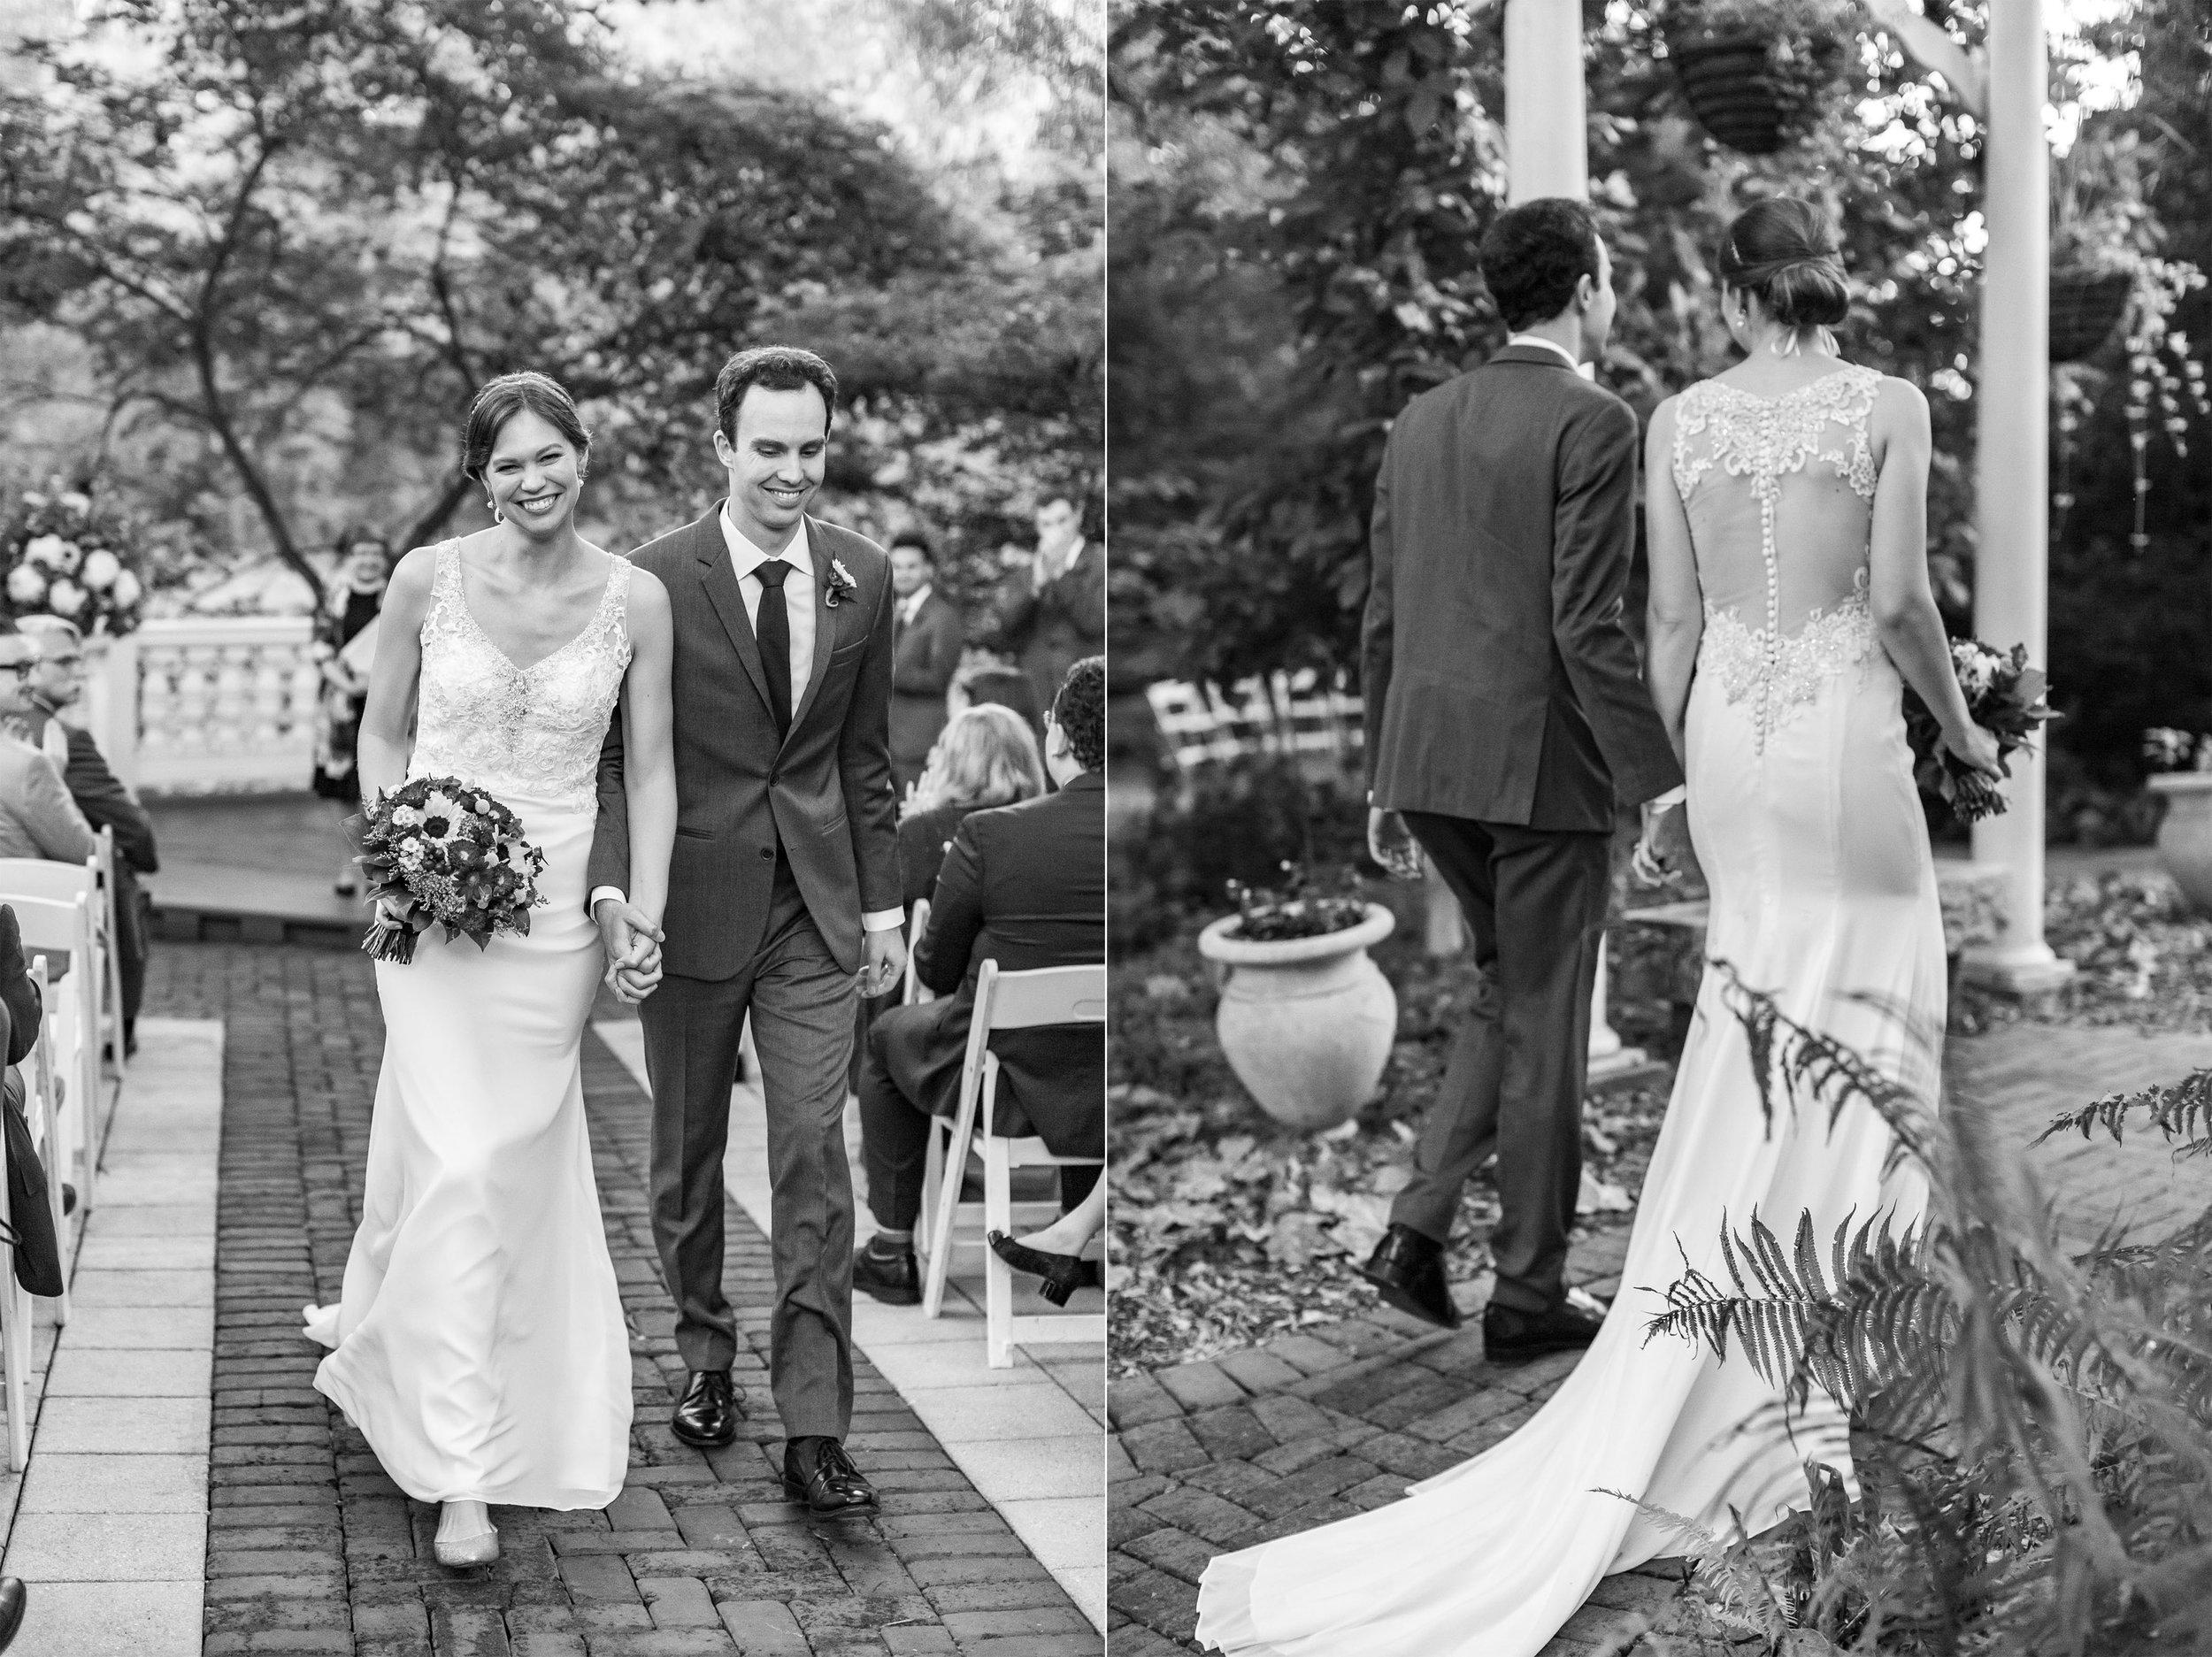 Wedding photos of bride and groom at Maryland's Elkridge Furnace Inn venue